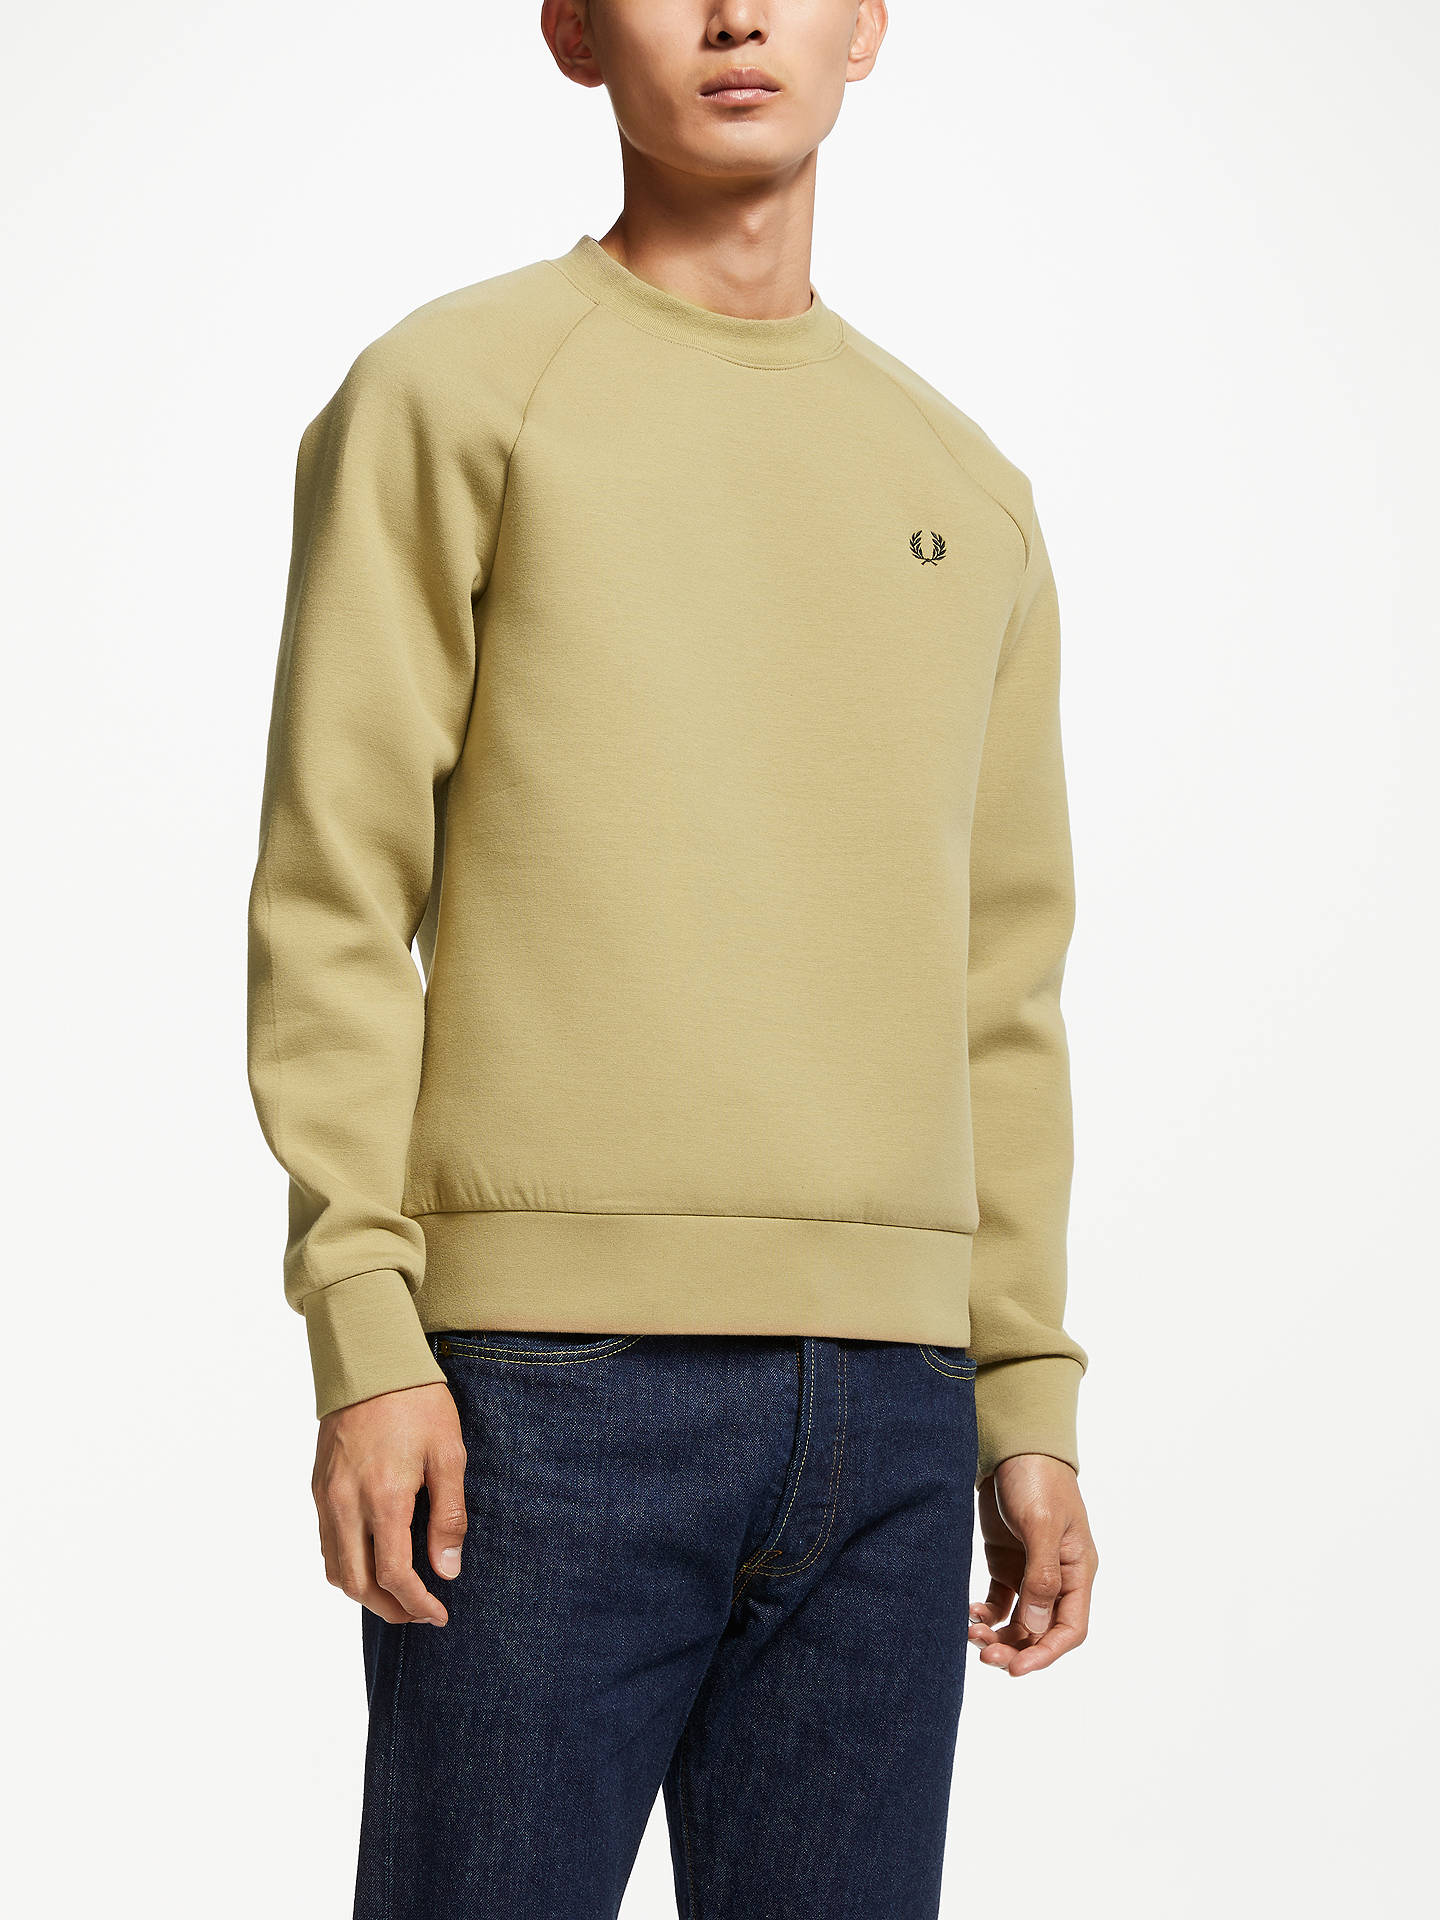 cdbf6e150e41 Buy Fred Perry Elmwood Interlock Crew Neck Sweatshirt